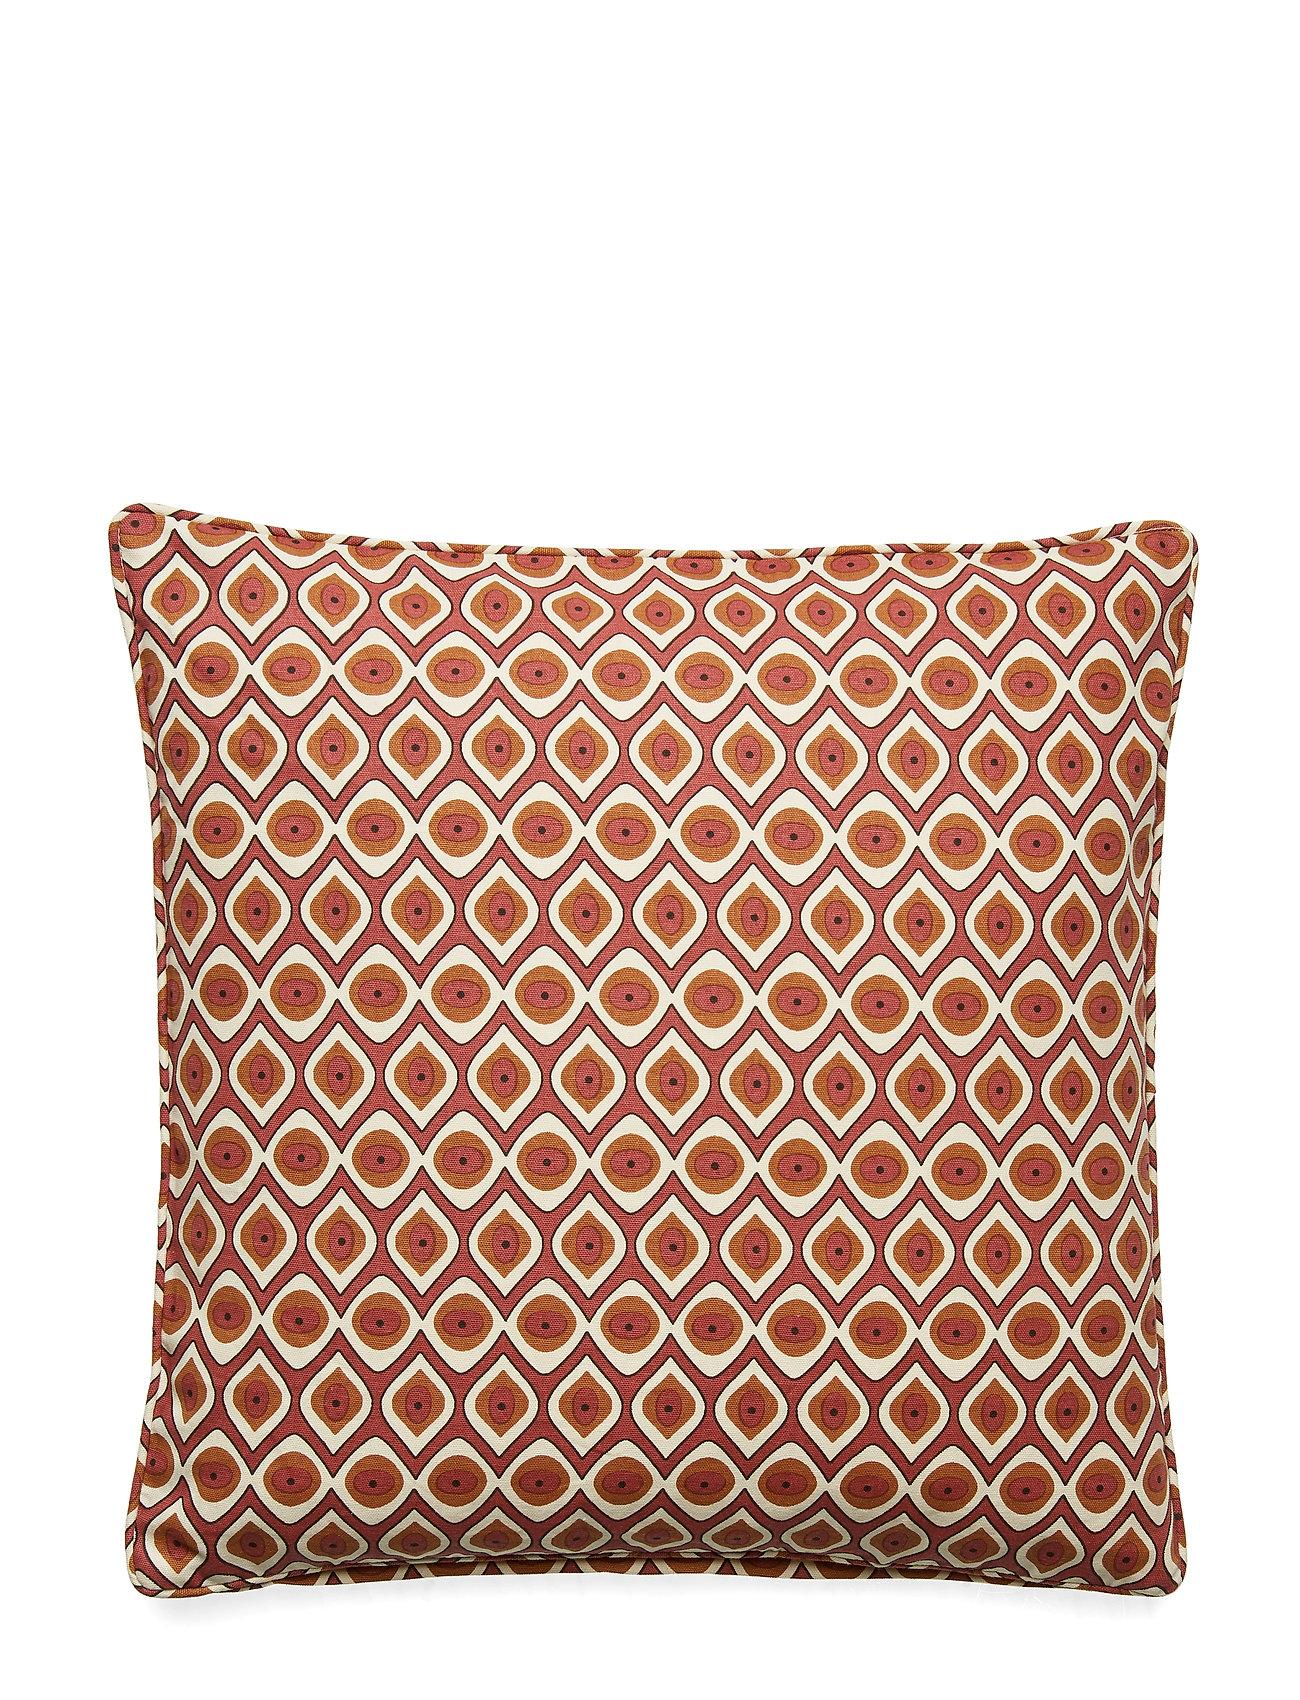 DAY Home Day Modern Cushion Cover - CICEK